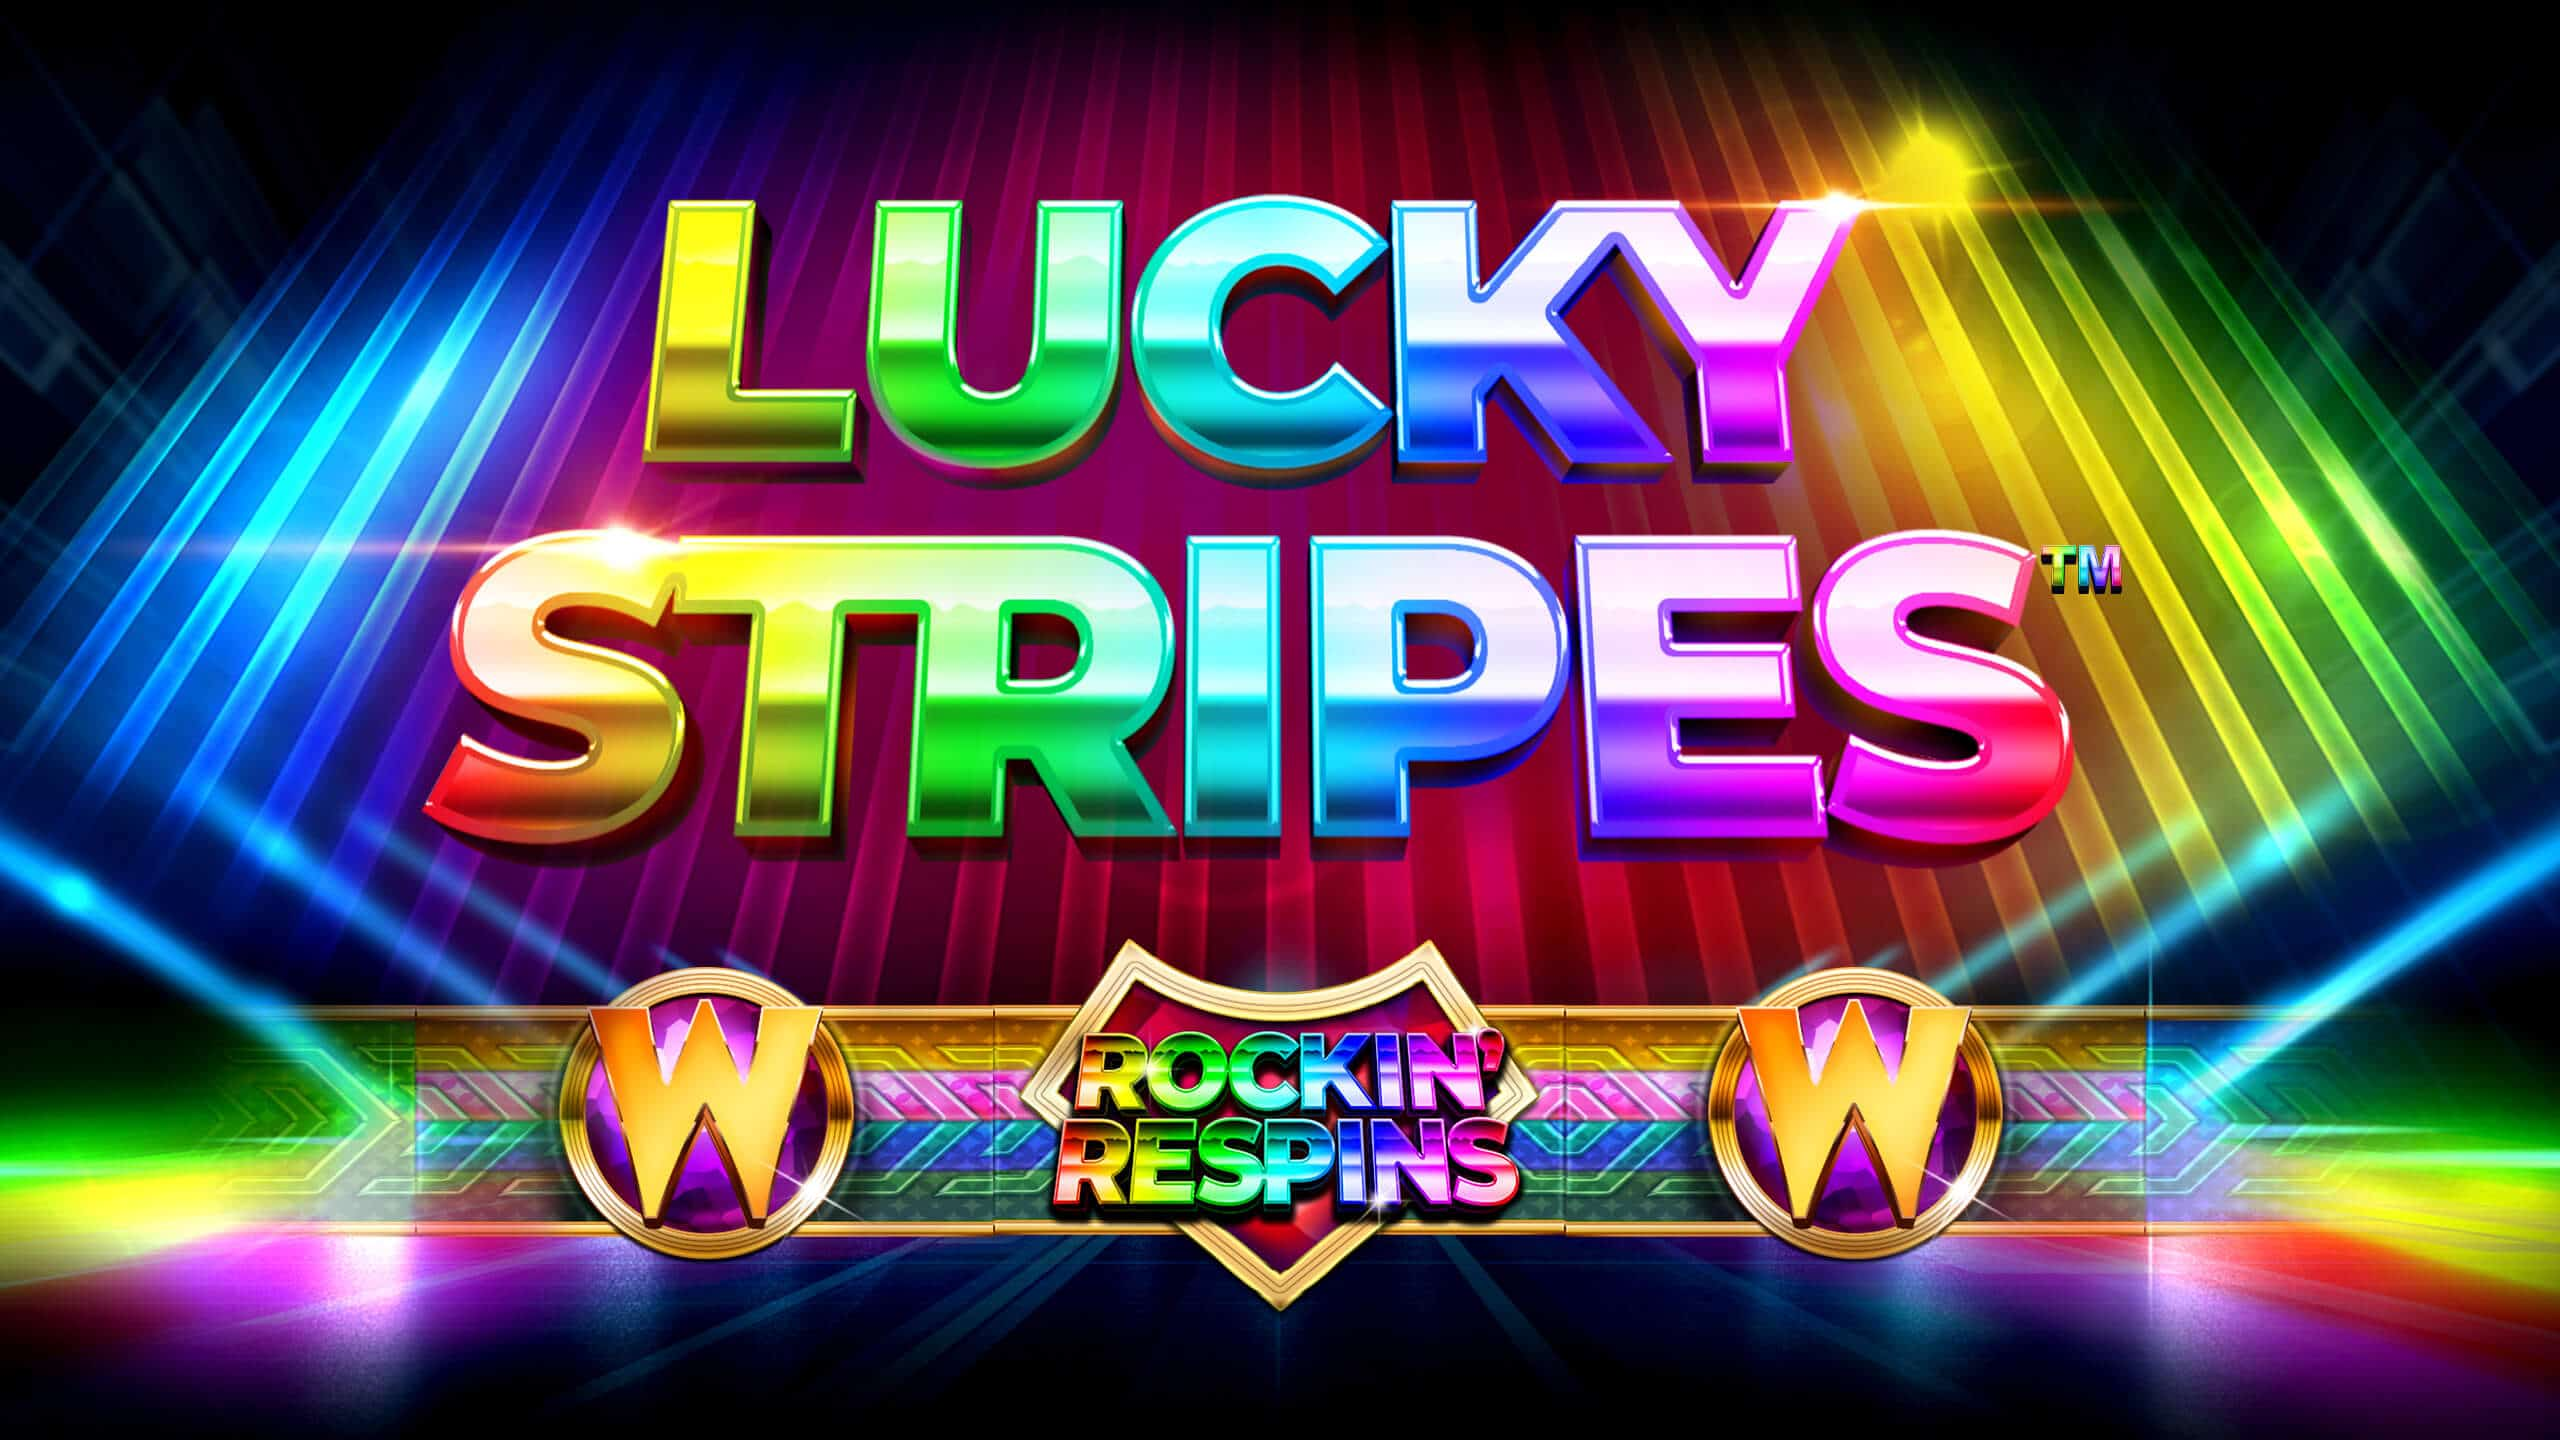 Lucky Stripes Slot Machine